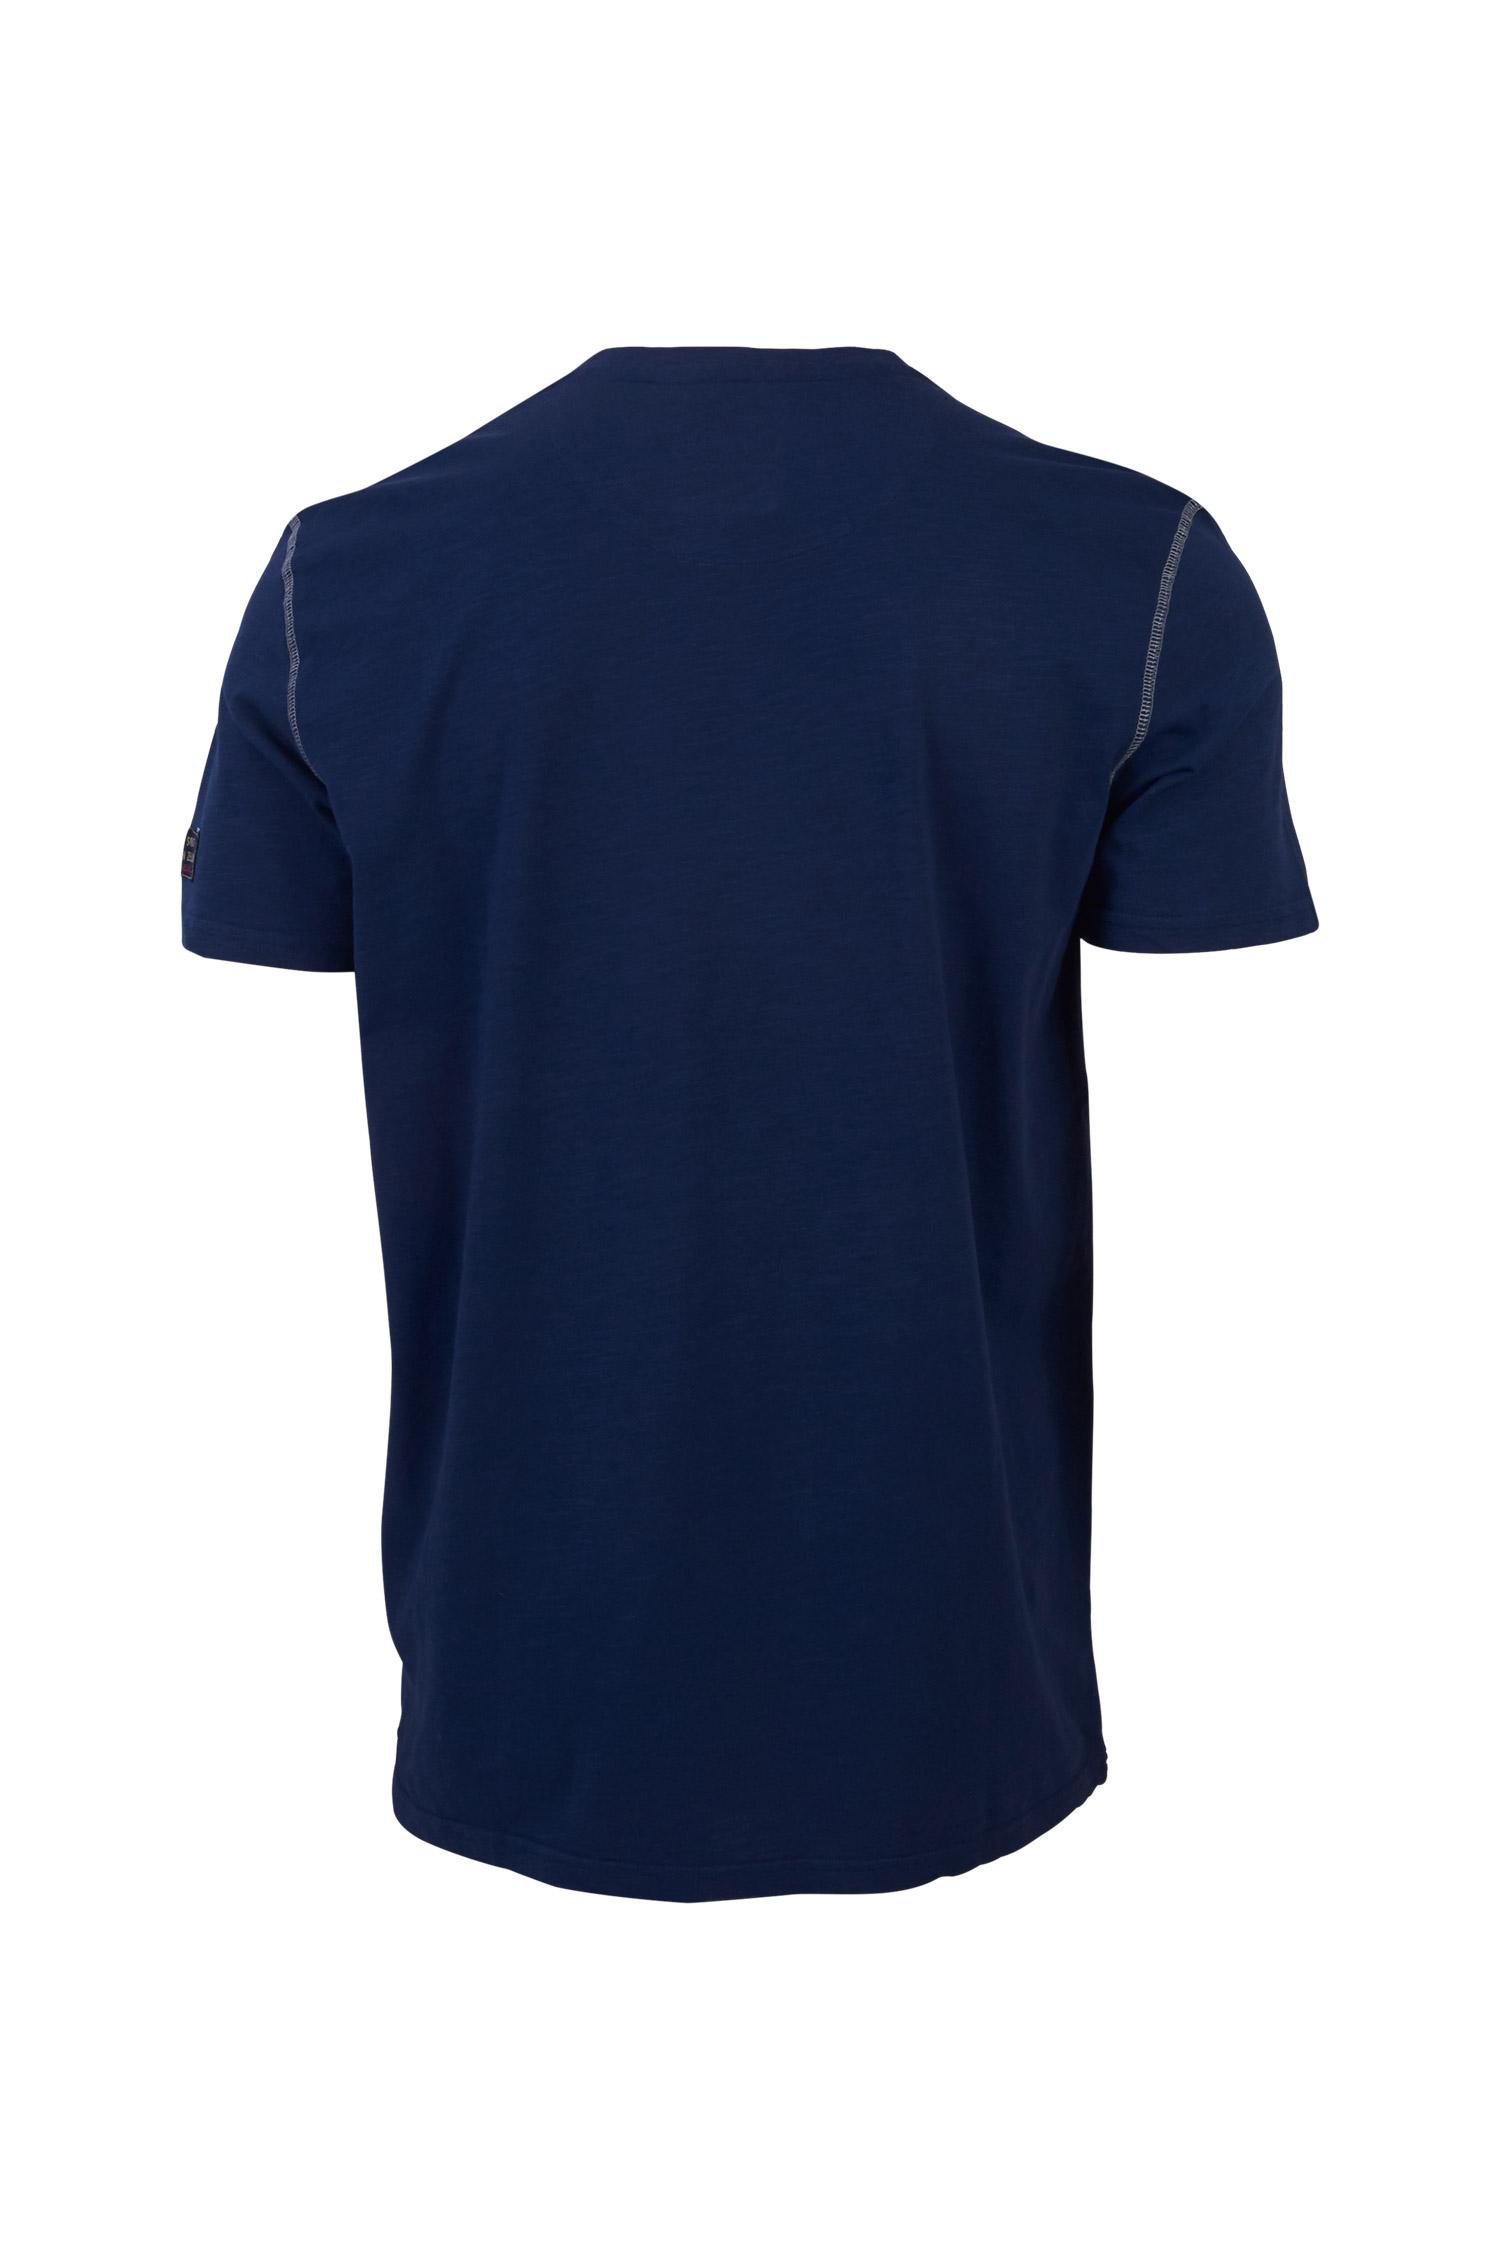 Sport, Camisetas M. Corta, 109151, MARINO | Zoom